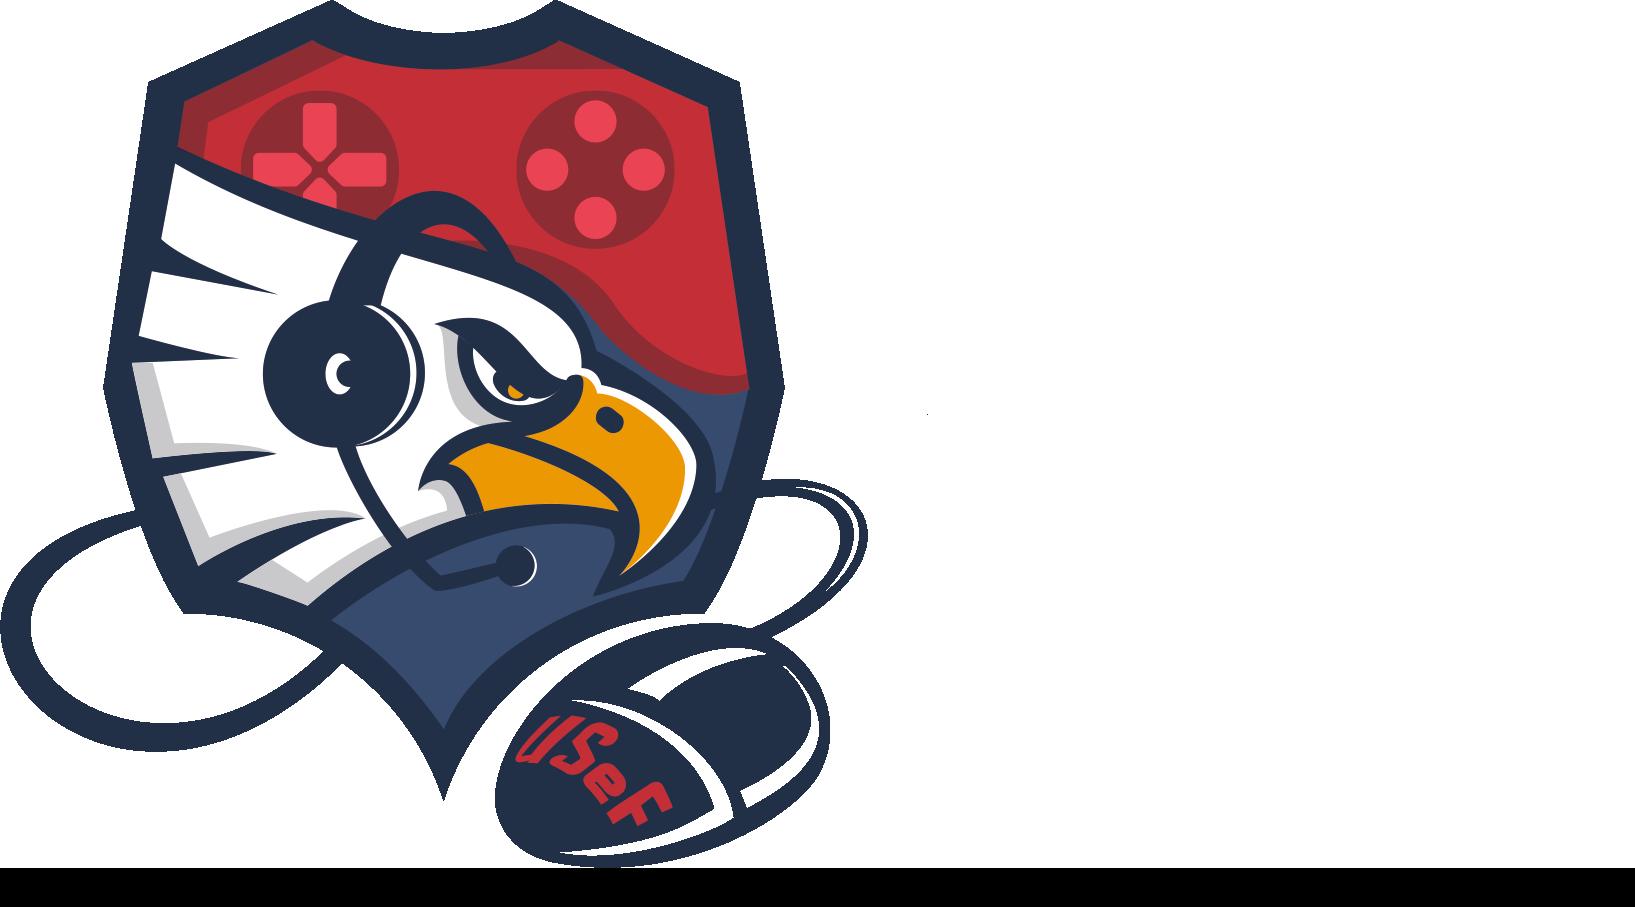 usef logo